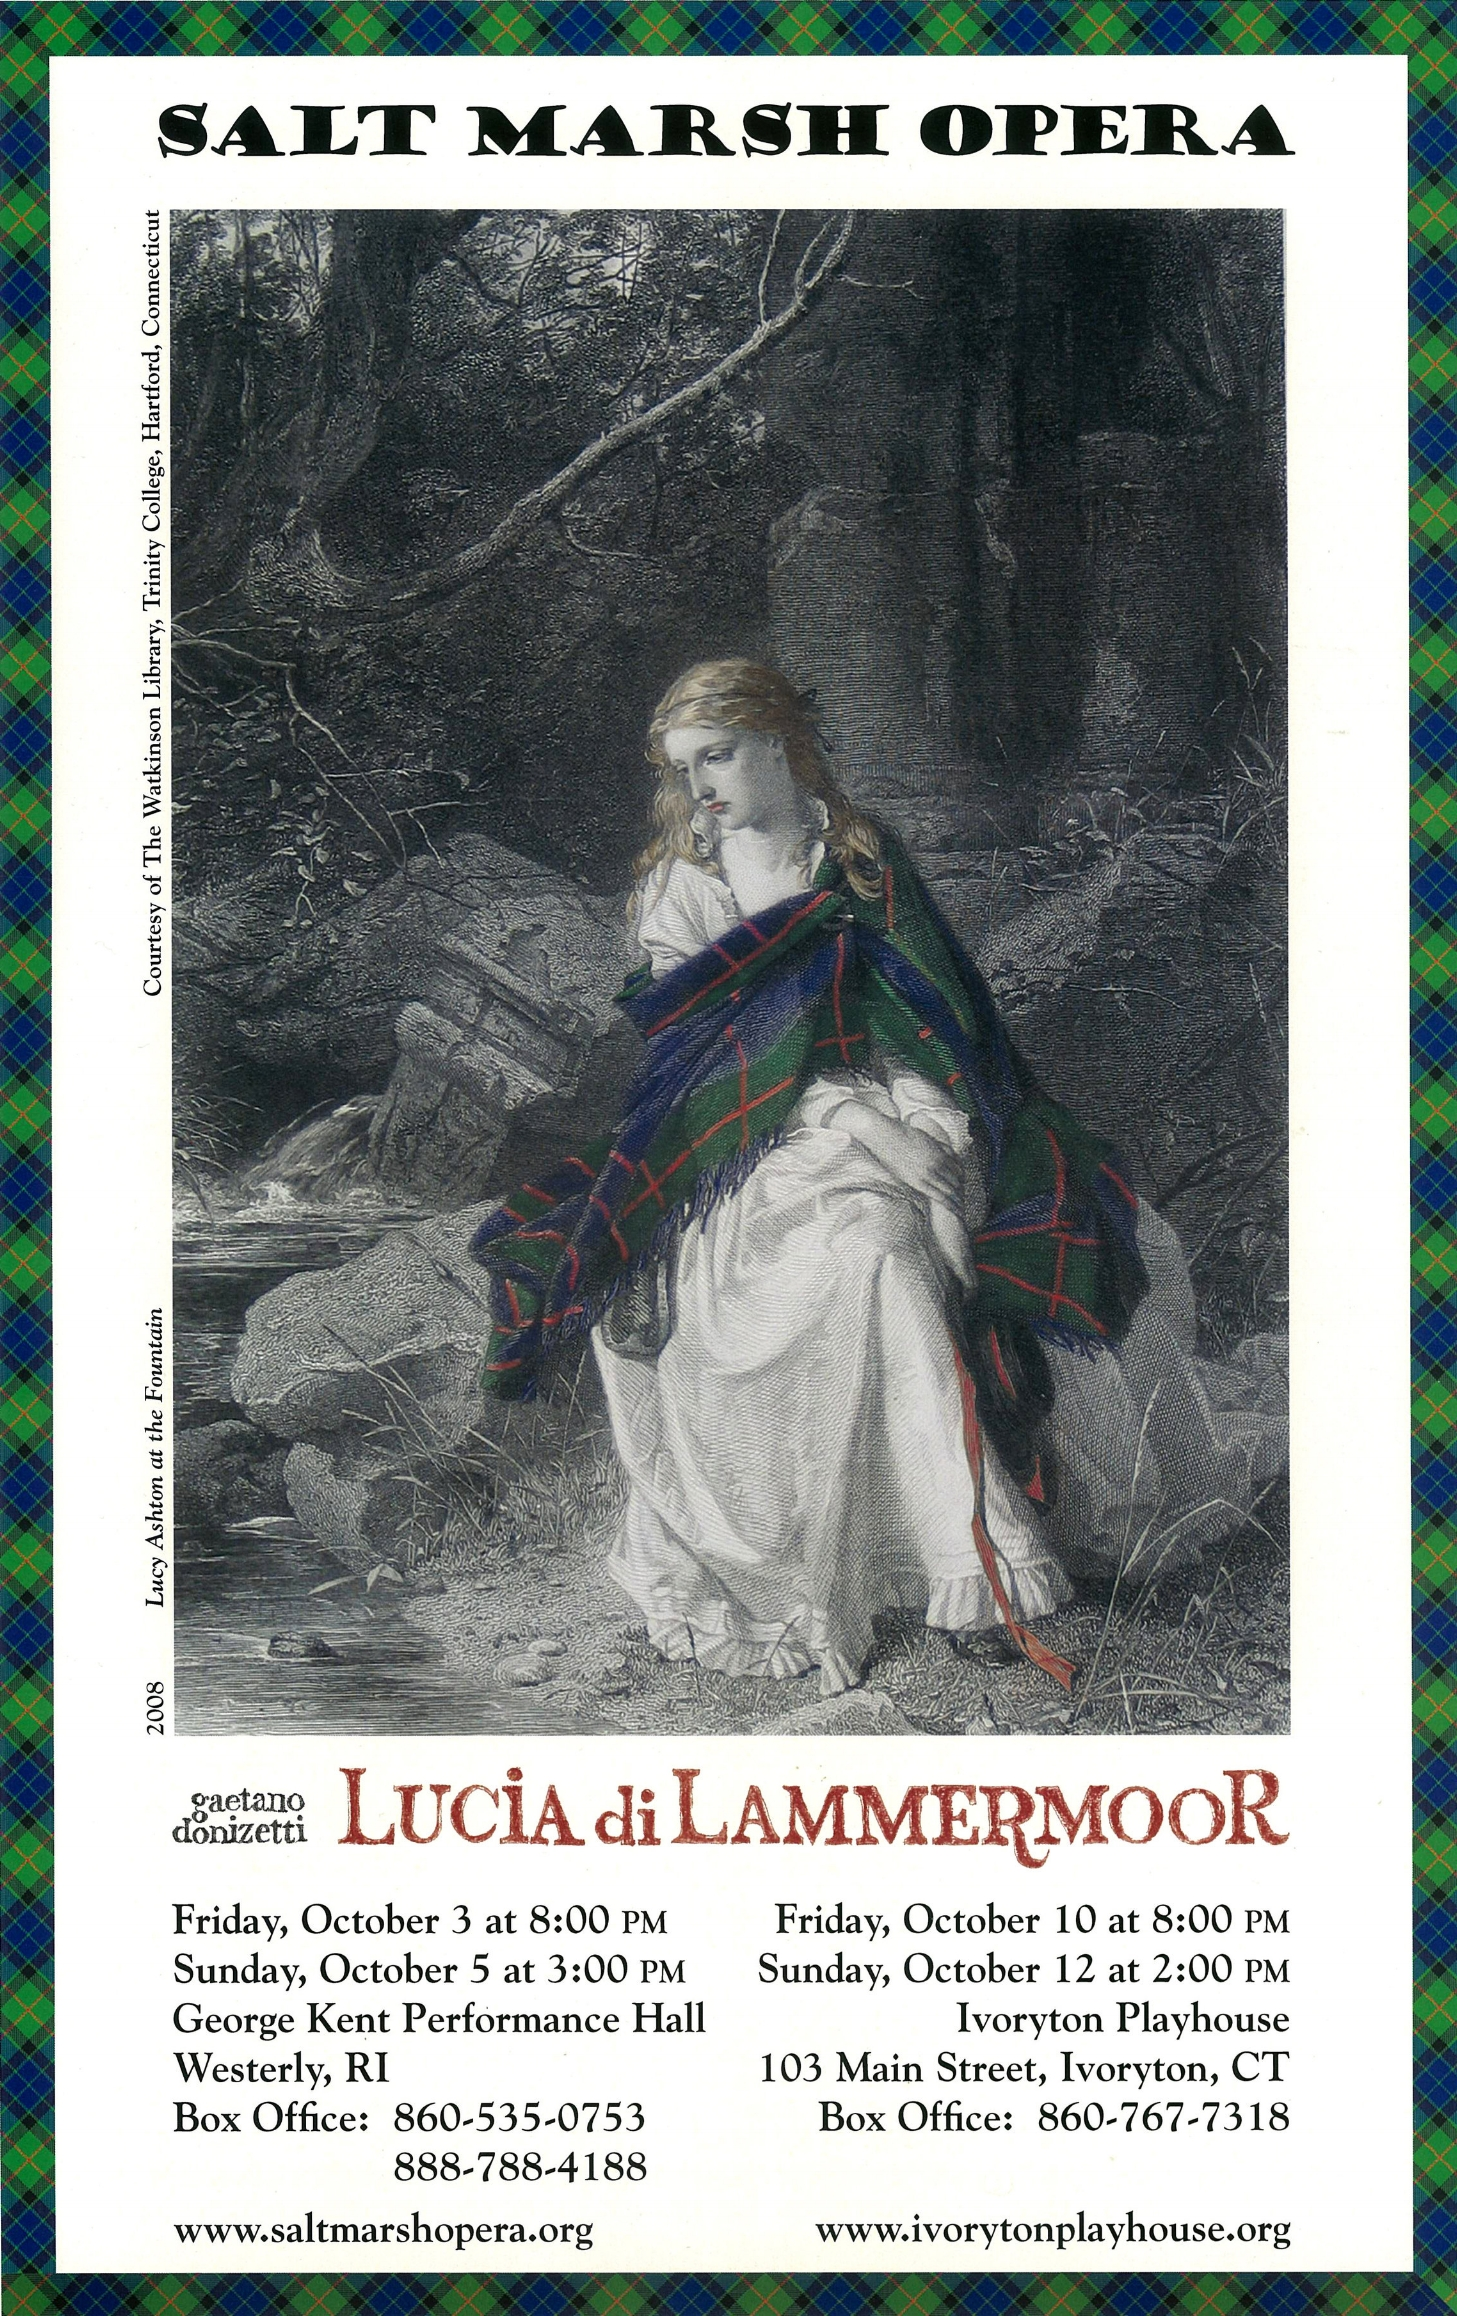 smo lucia di lammermoor poster.jpg